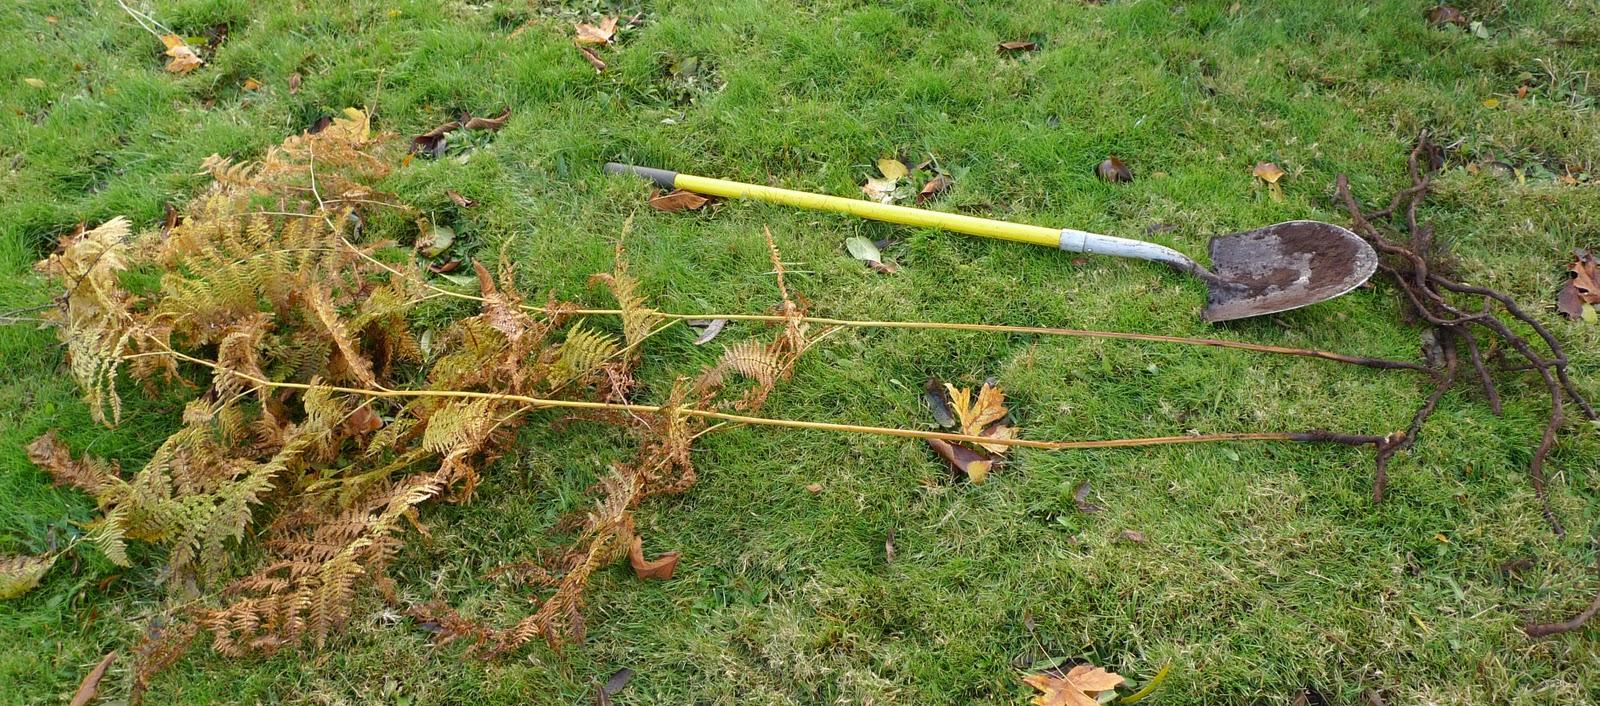 Fern Rhizome Wild Harvests: ...